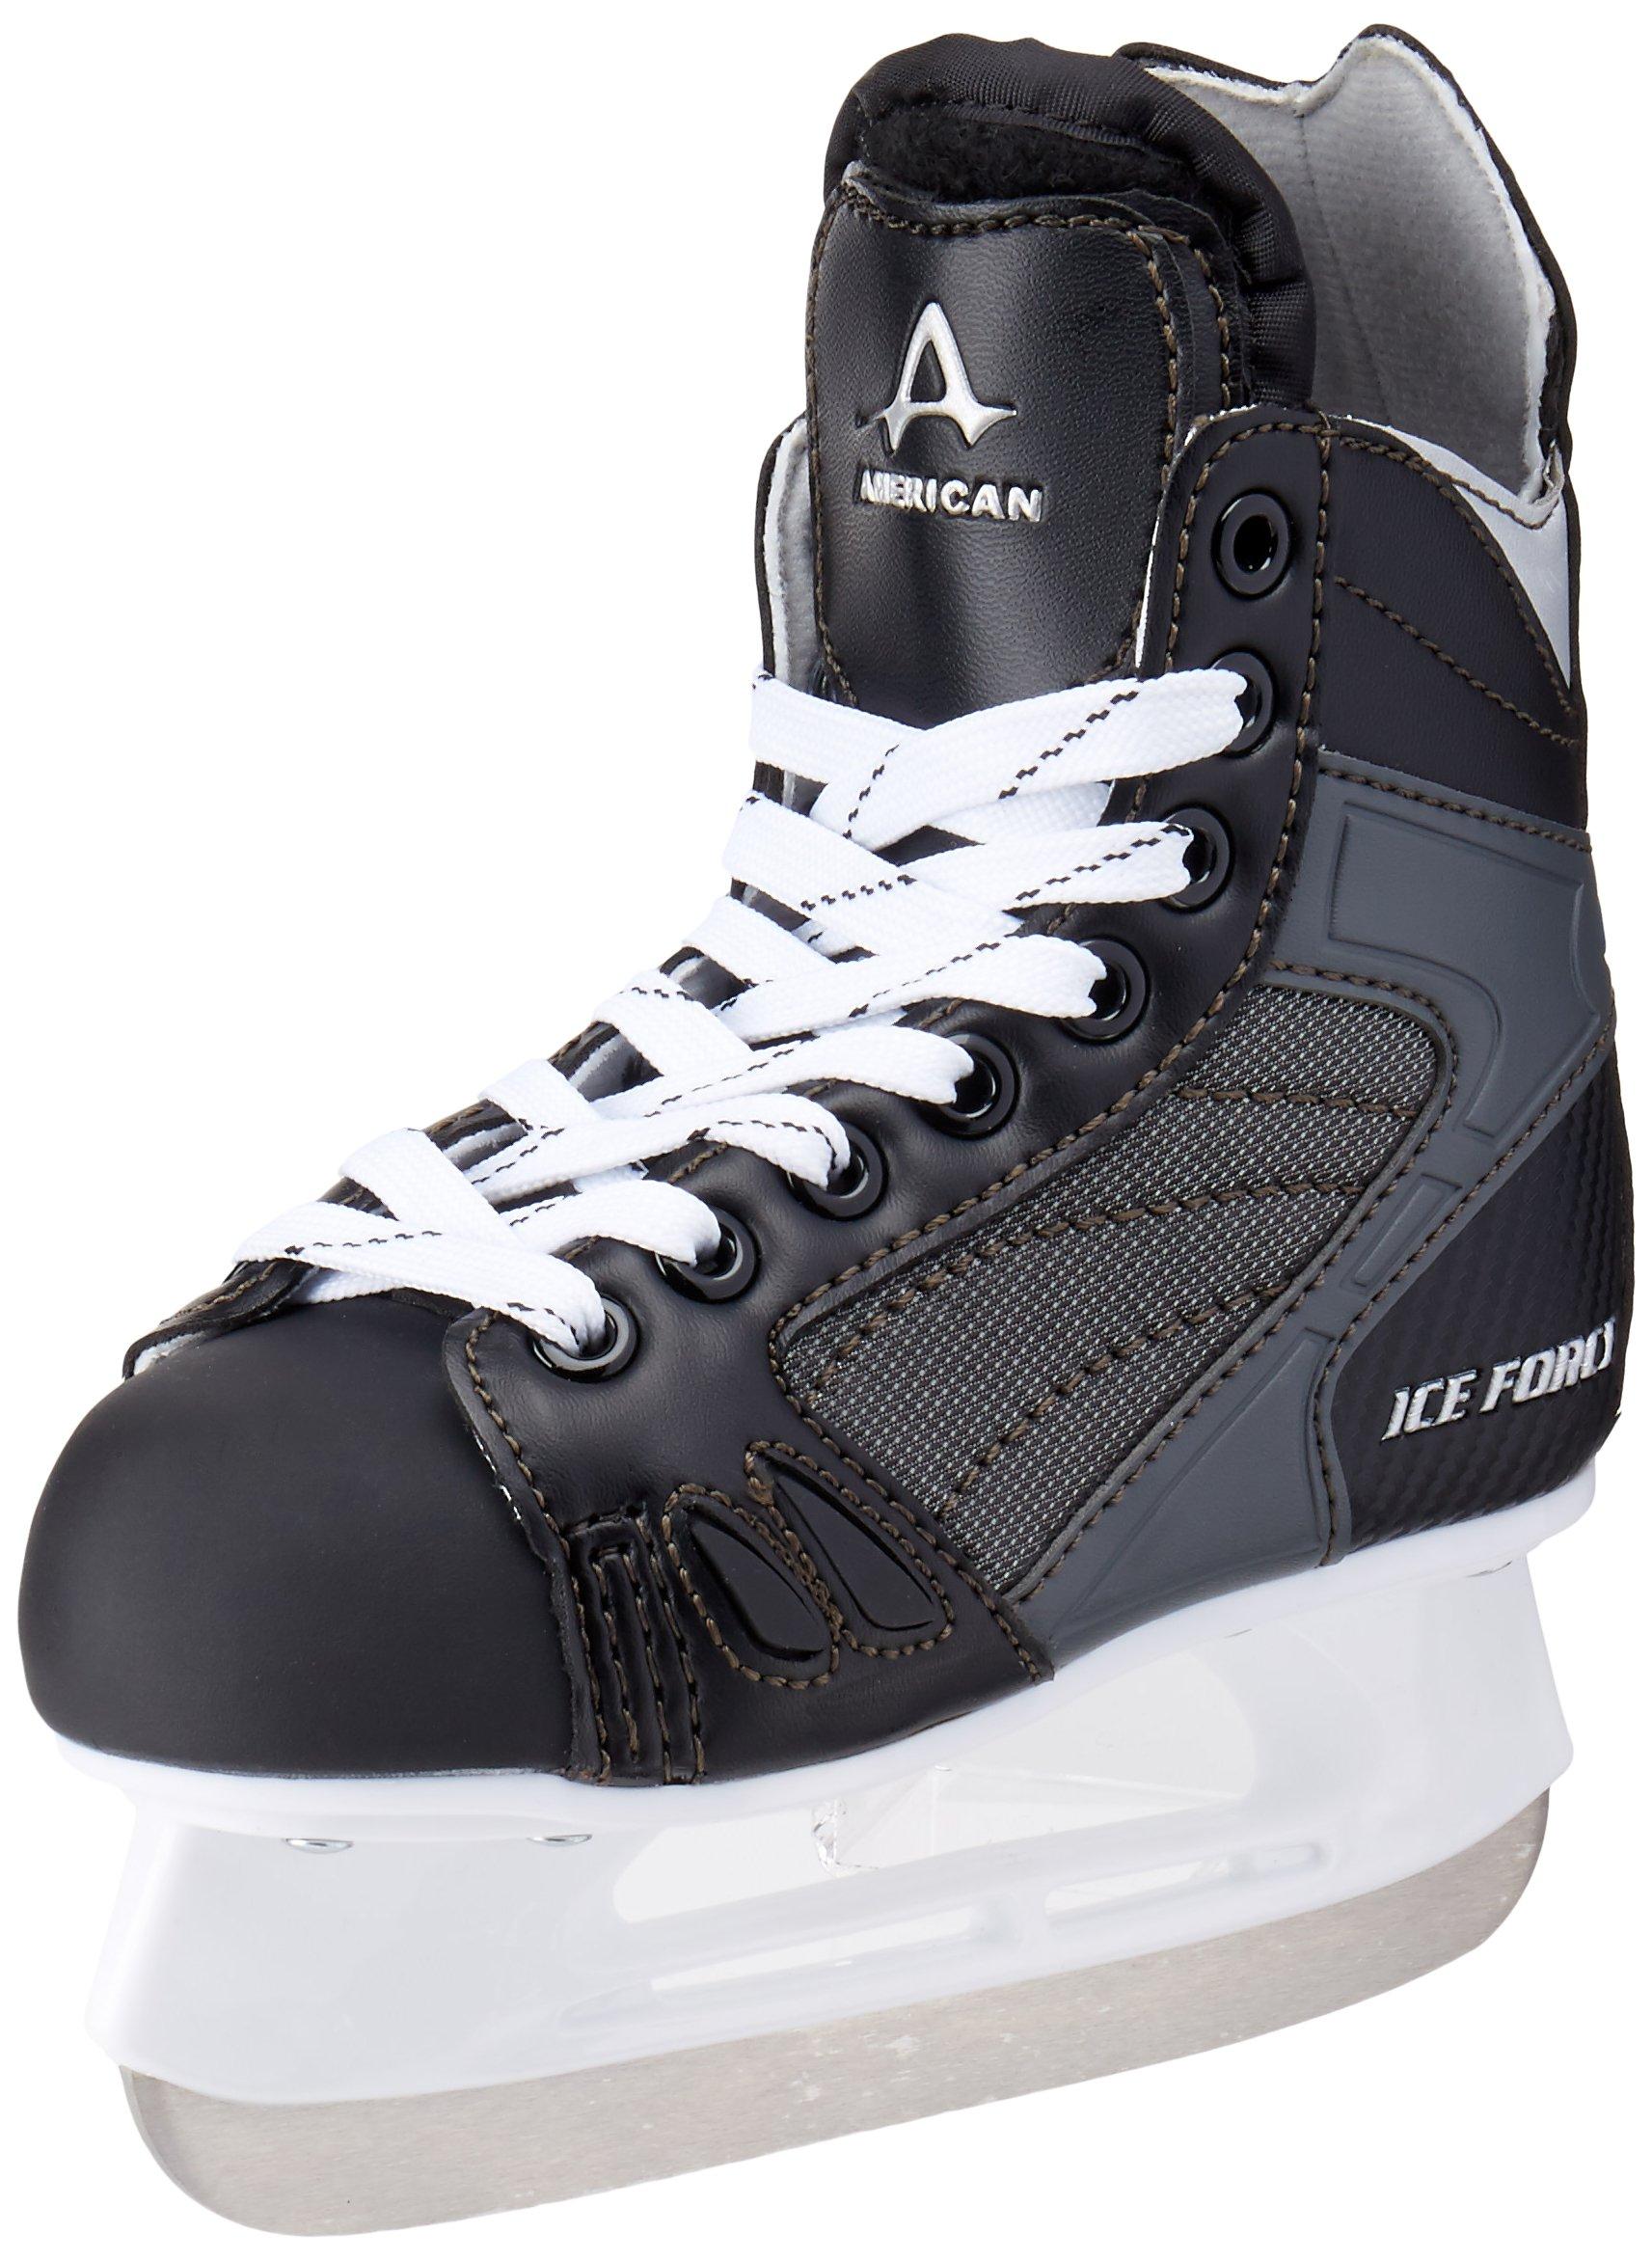 American Athletic Shoe Boy's Ice Force Hockey Skates, Black, 10 Y by American Athletic